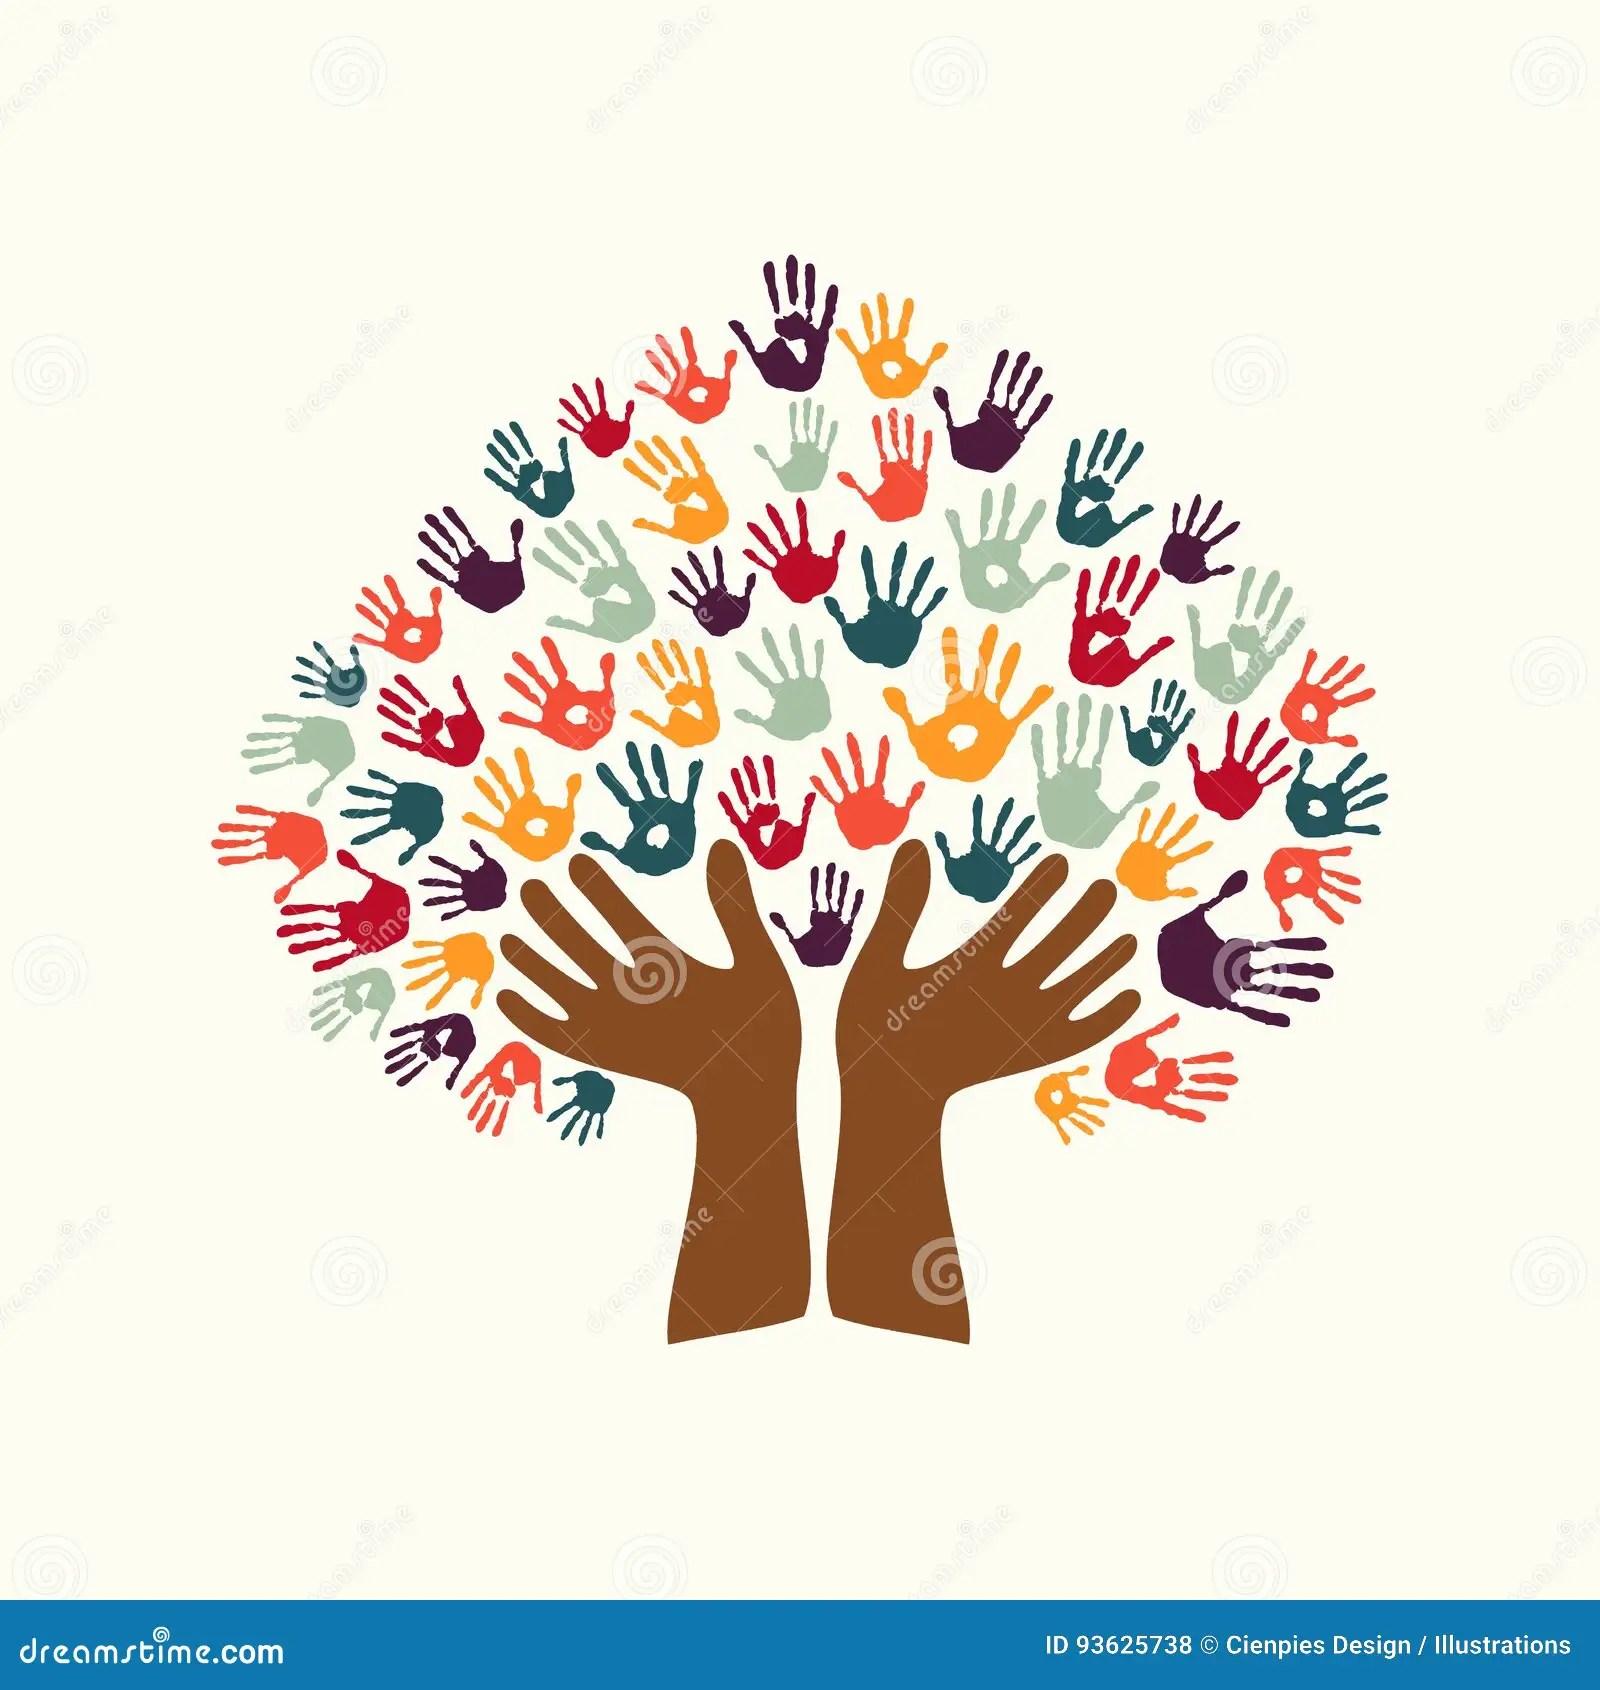 Hand Print Ethnic Tree Symbol Of Culture Diversity Stock